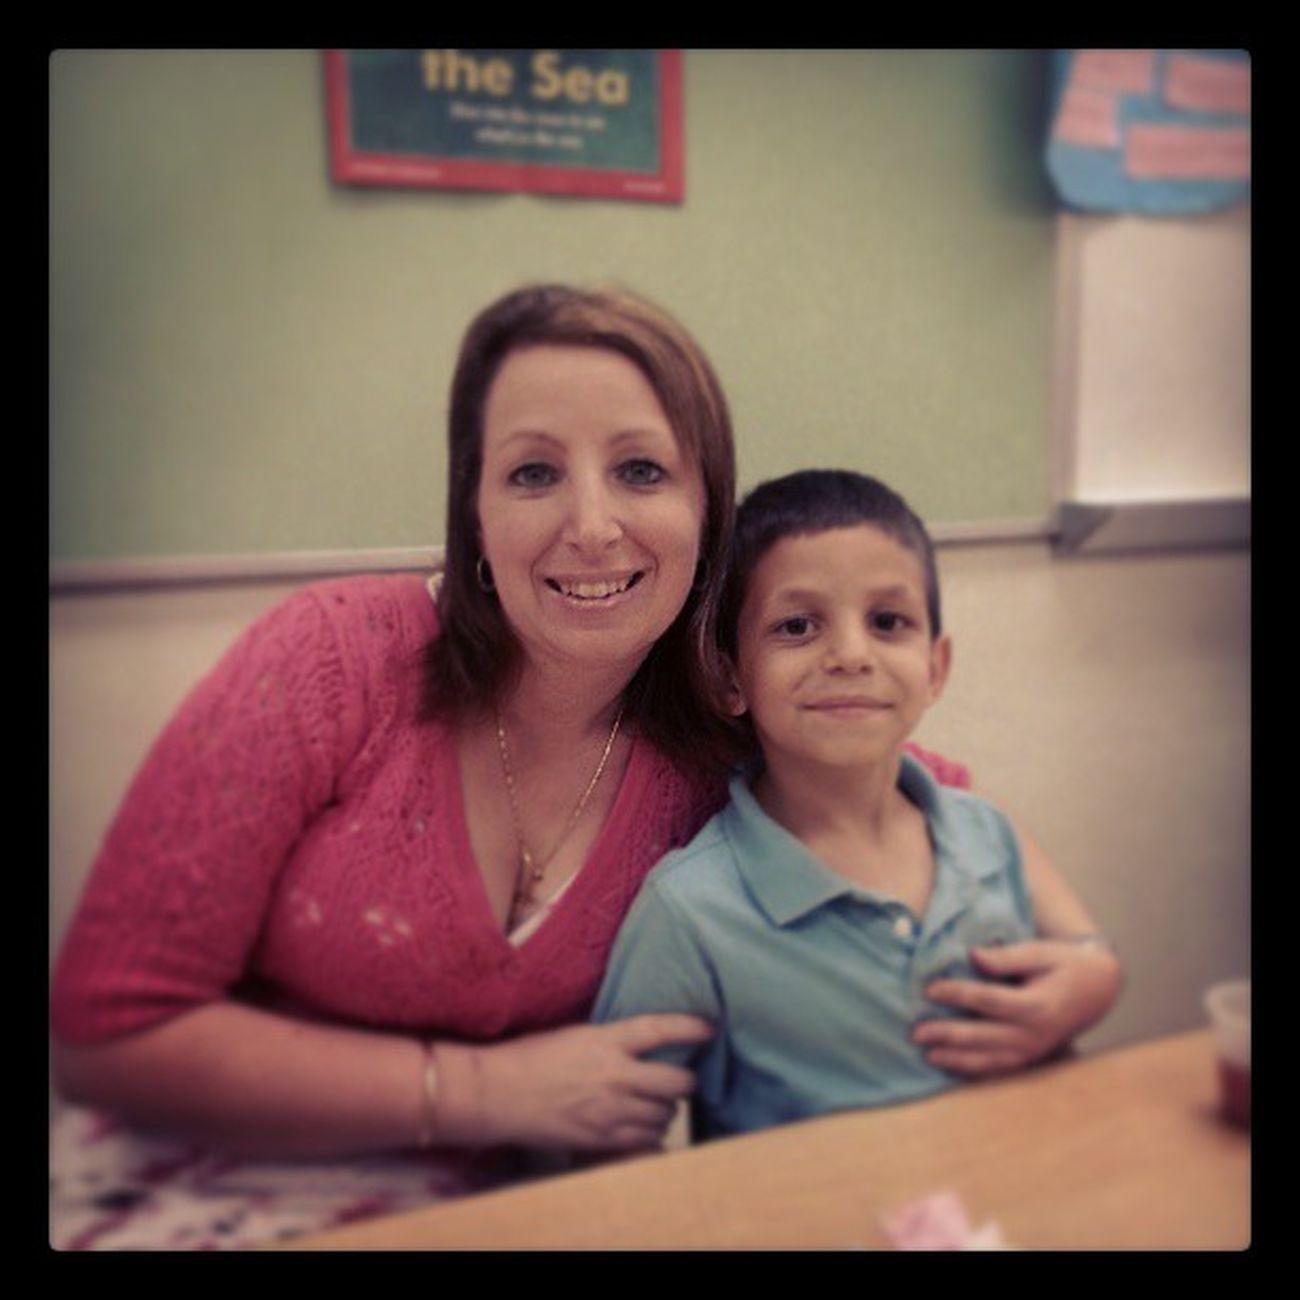 Mothersday Teaparty Son Kindergarten love family oaksteadelementary oakstead pascocountyschools @pascoschools